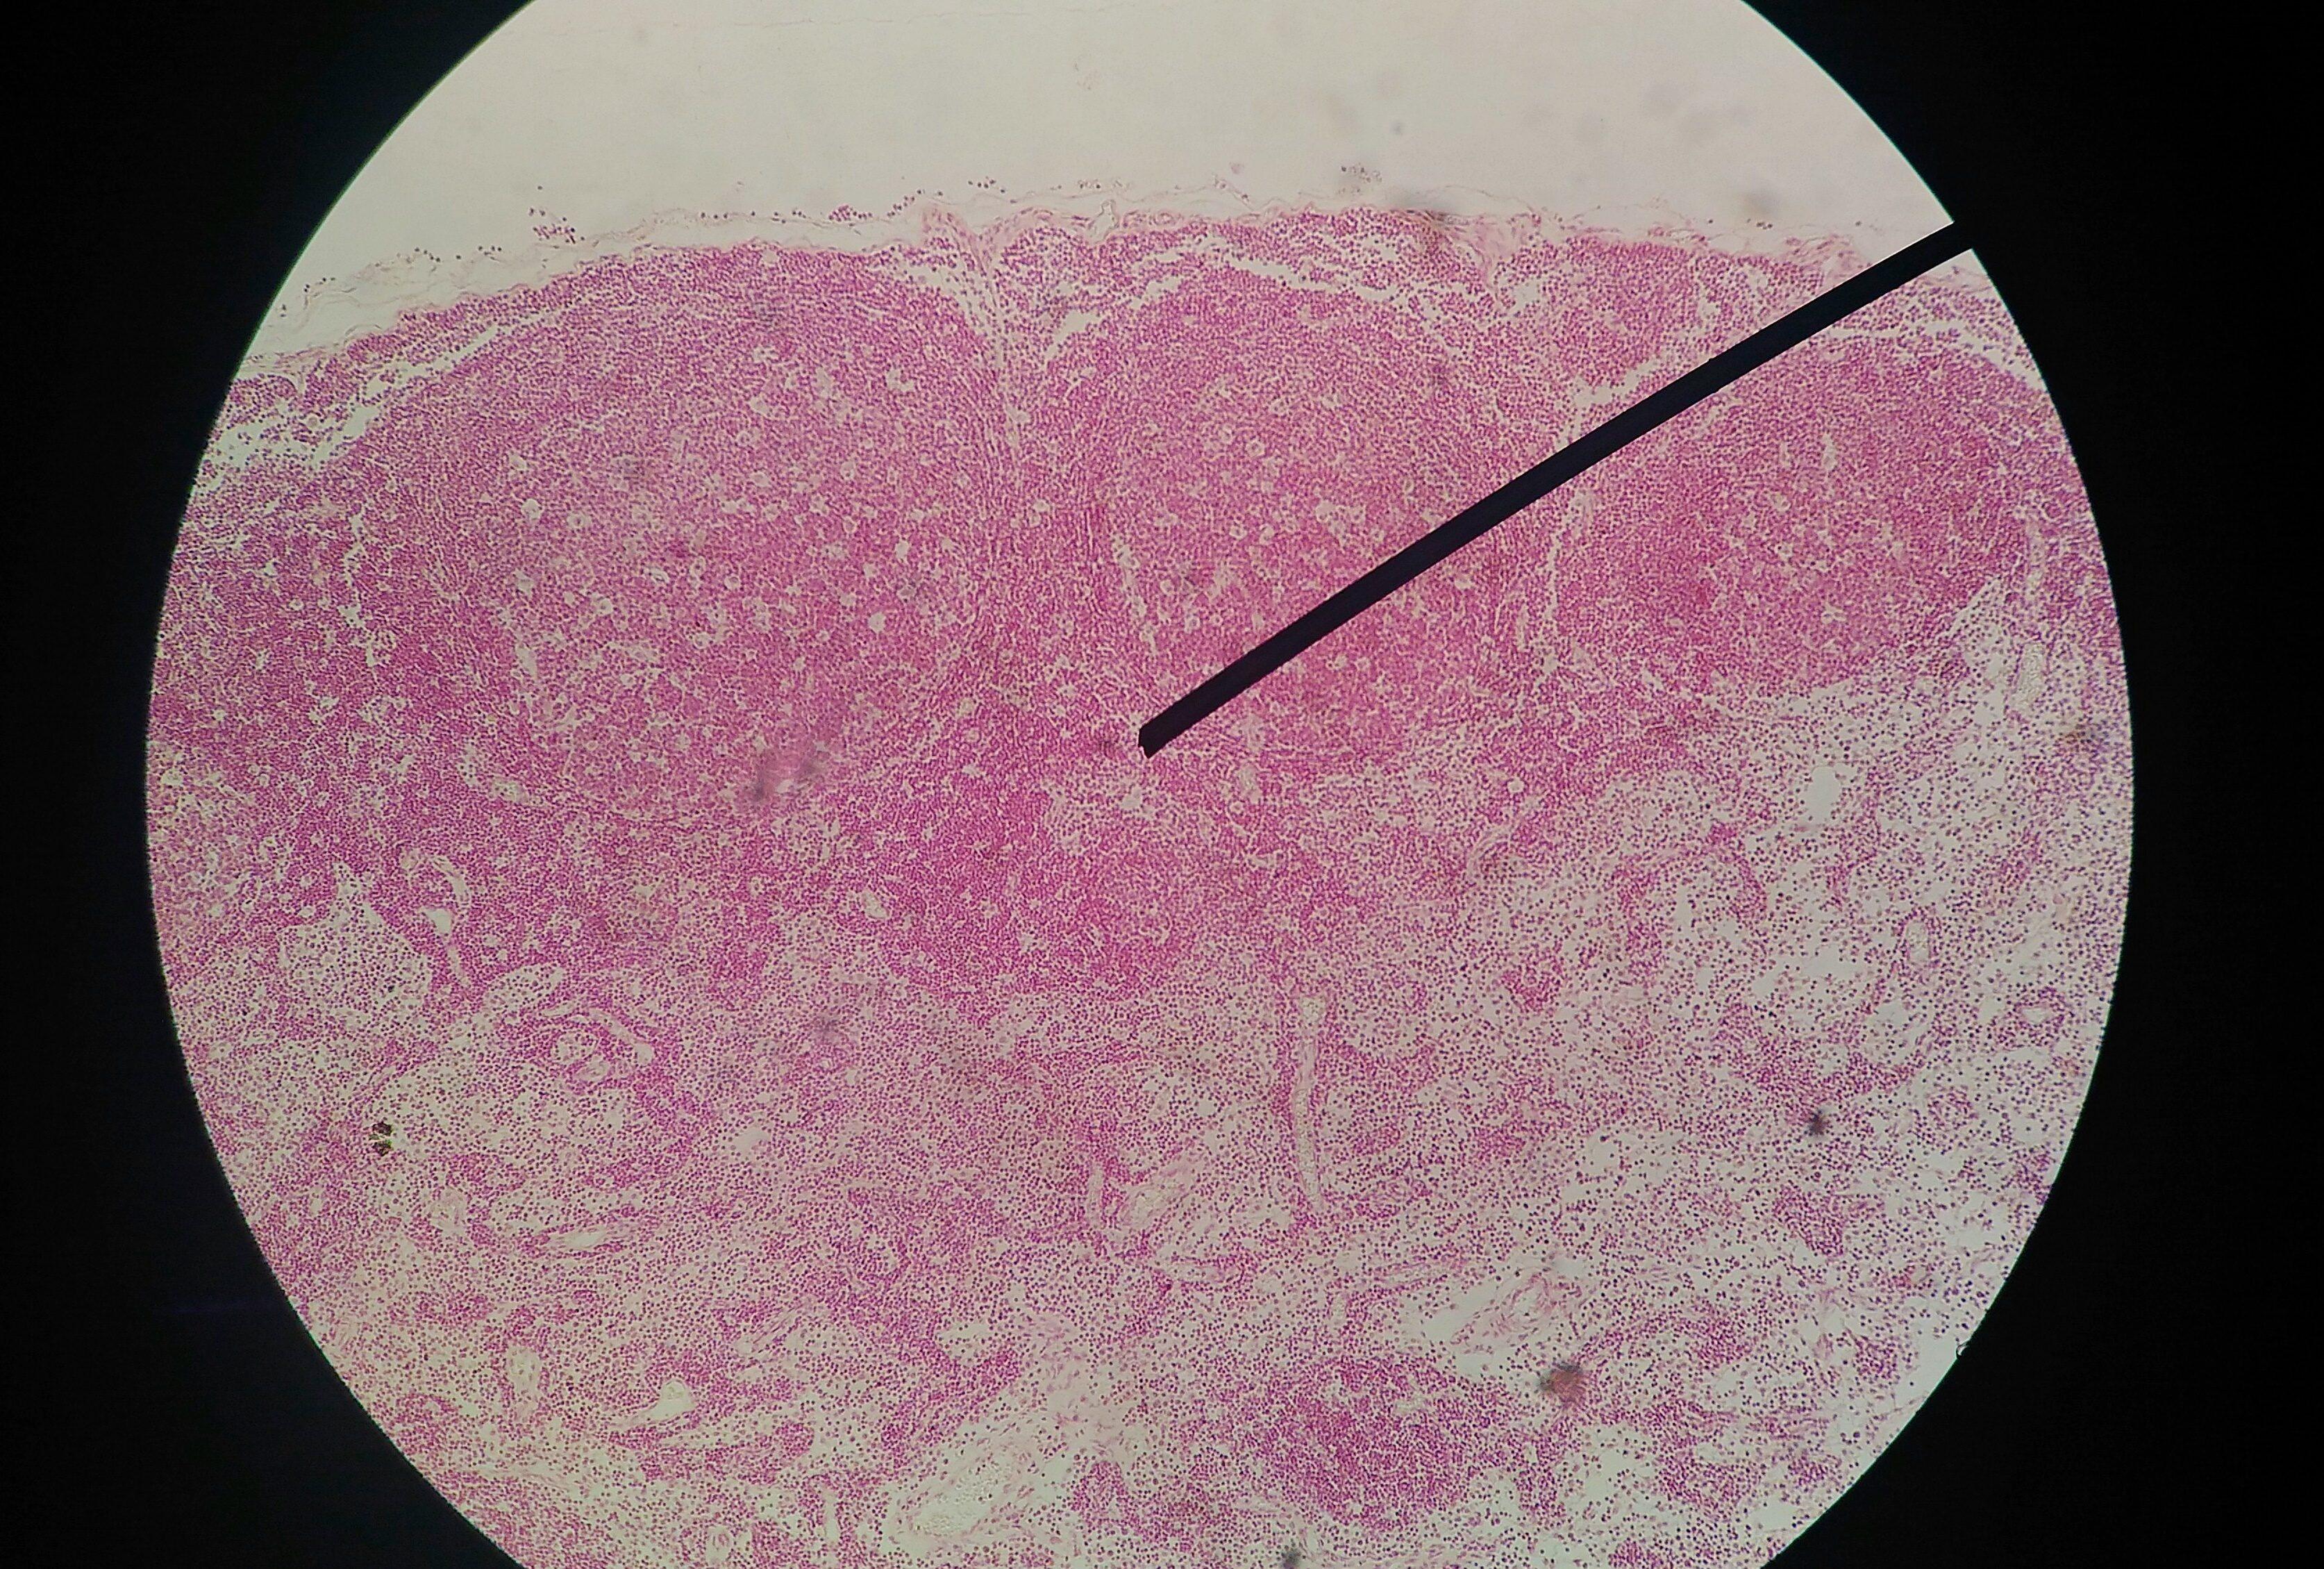 wart treatment dermnet hpv cervical cancer pictures